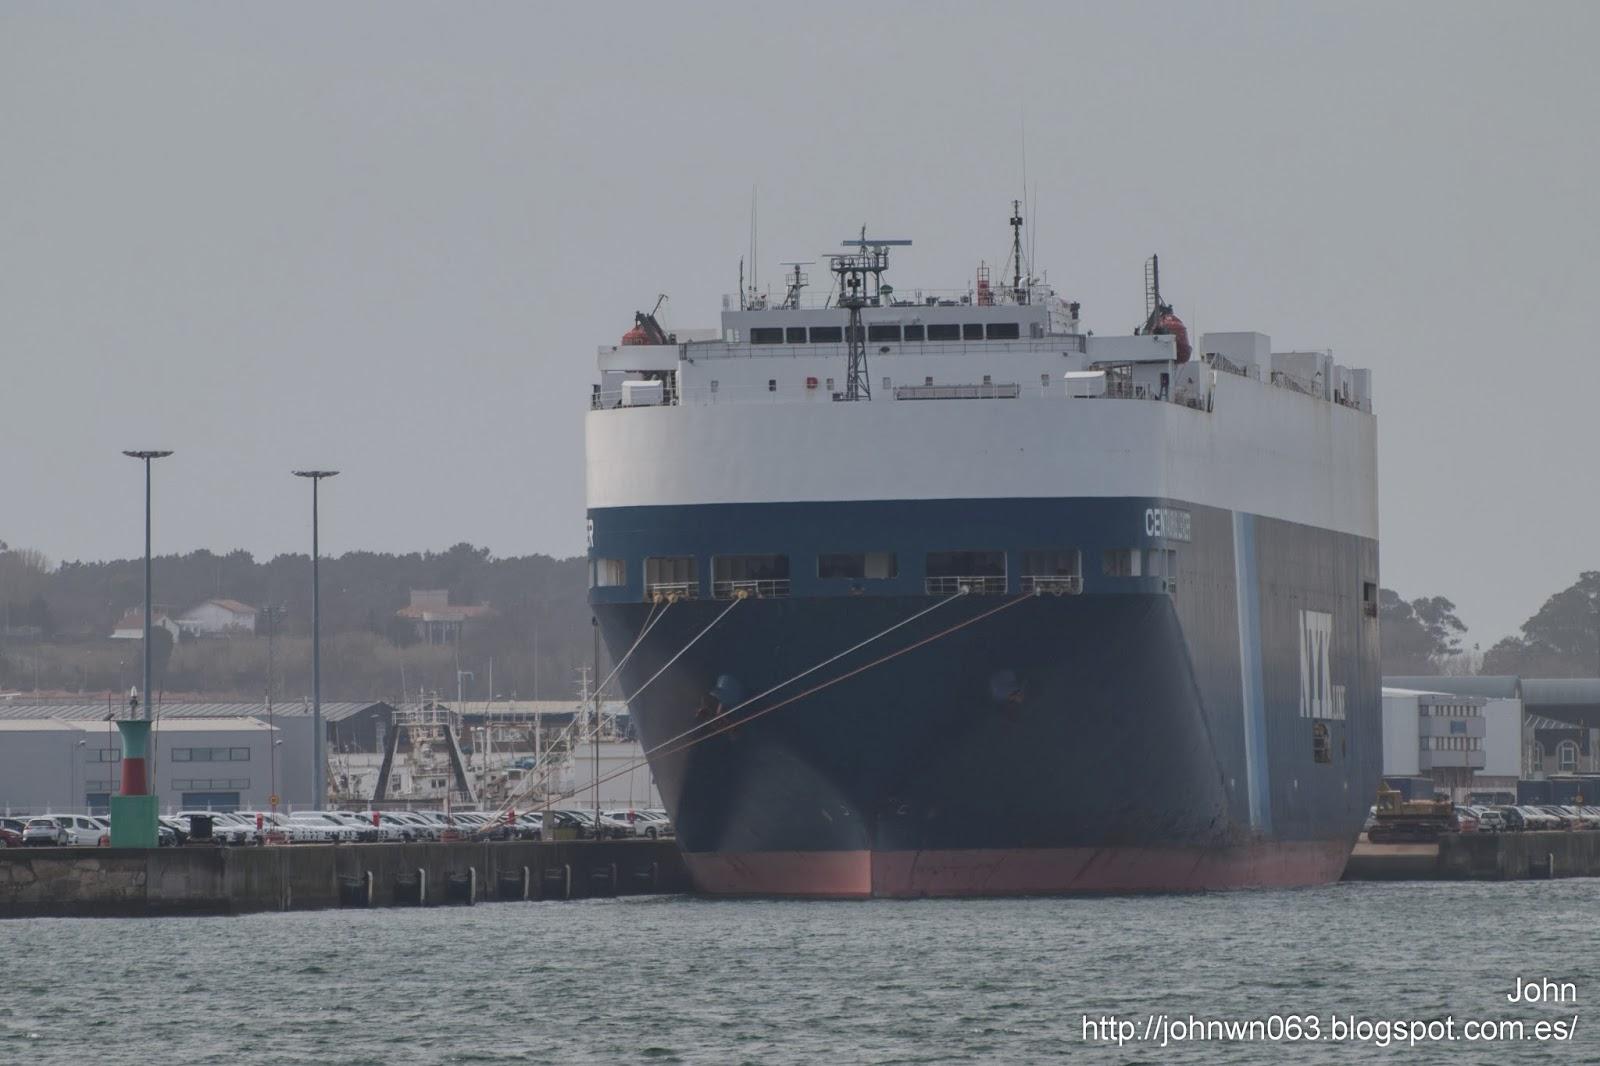 centaurus leader, fotos de barcos, vehicles carrier, vigo, bouzas